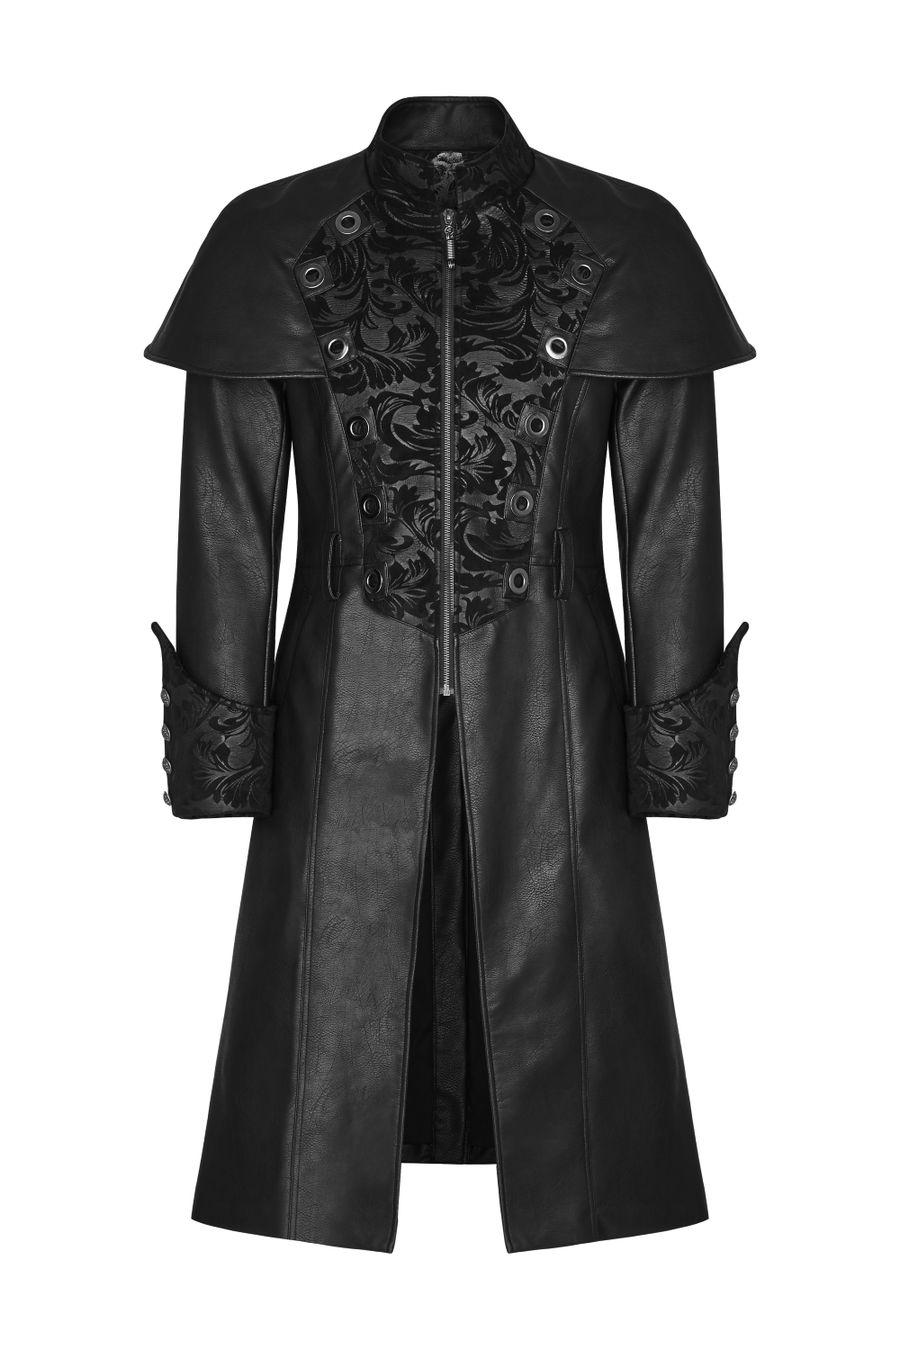 of homme cuir gothique vegan noir style thrones Manteau en game 4ARL35j